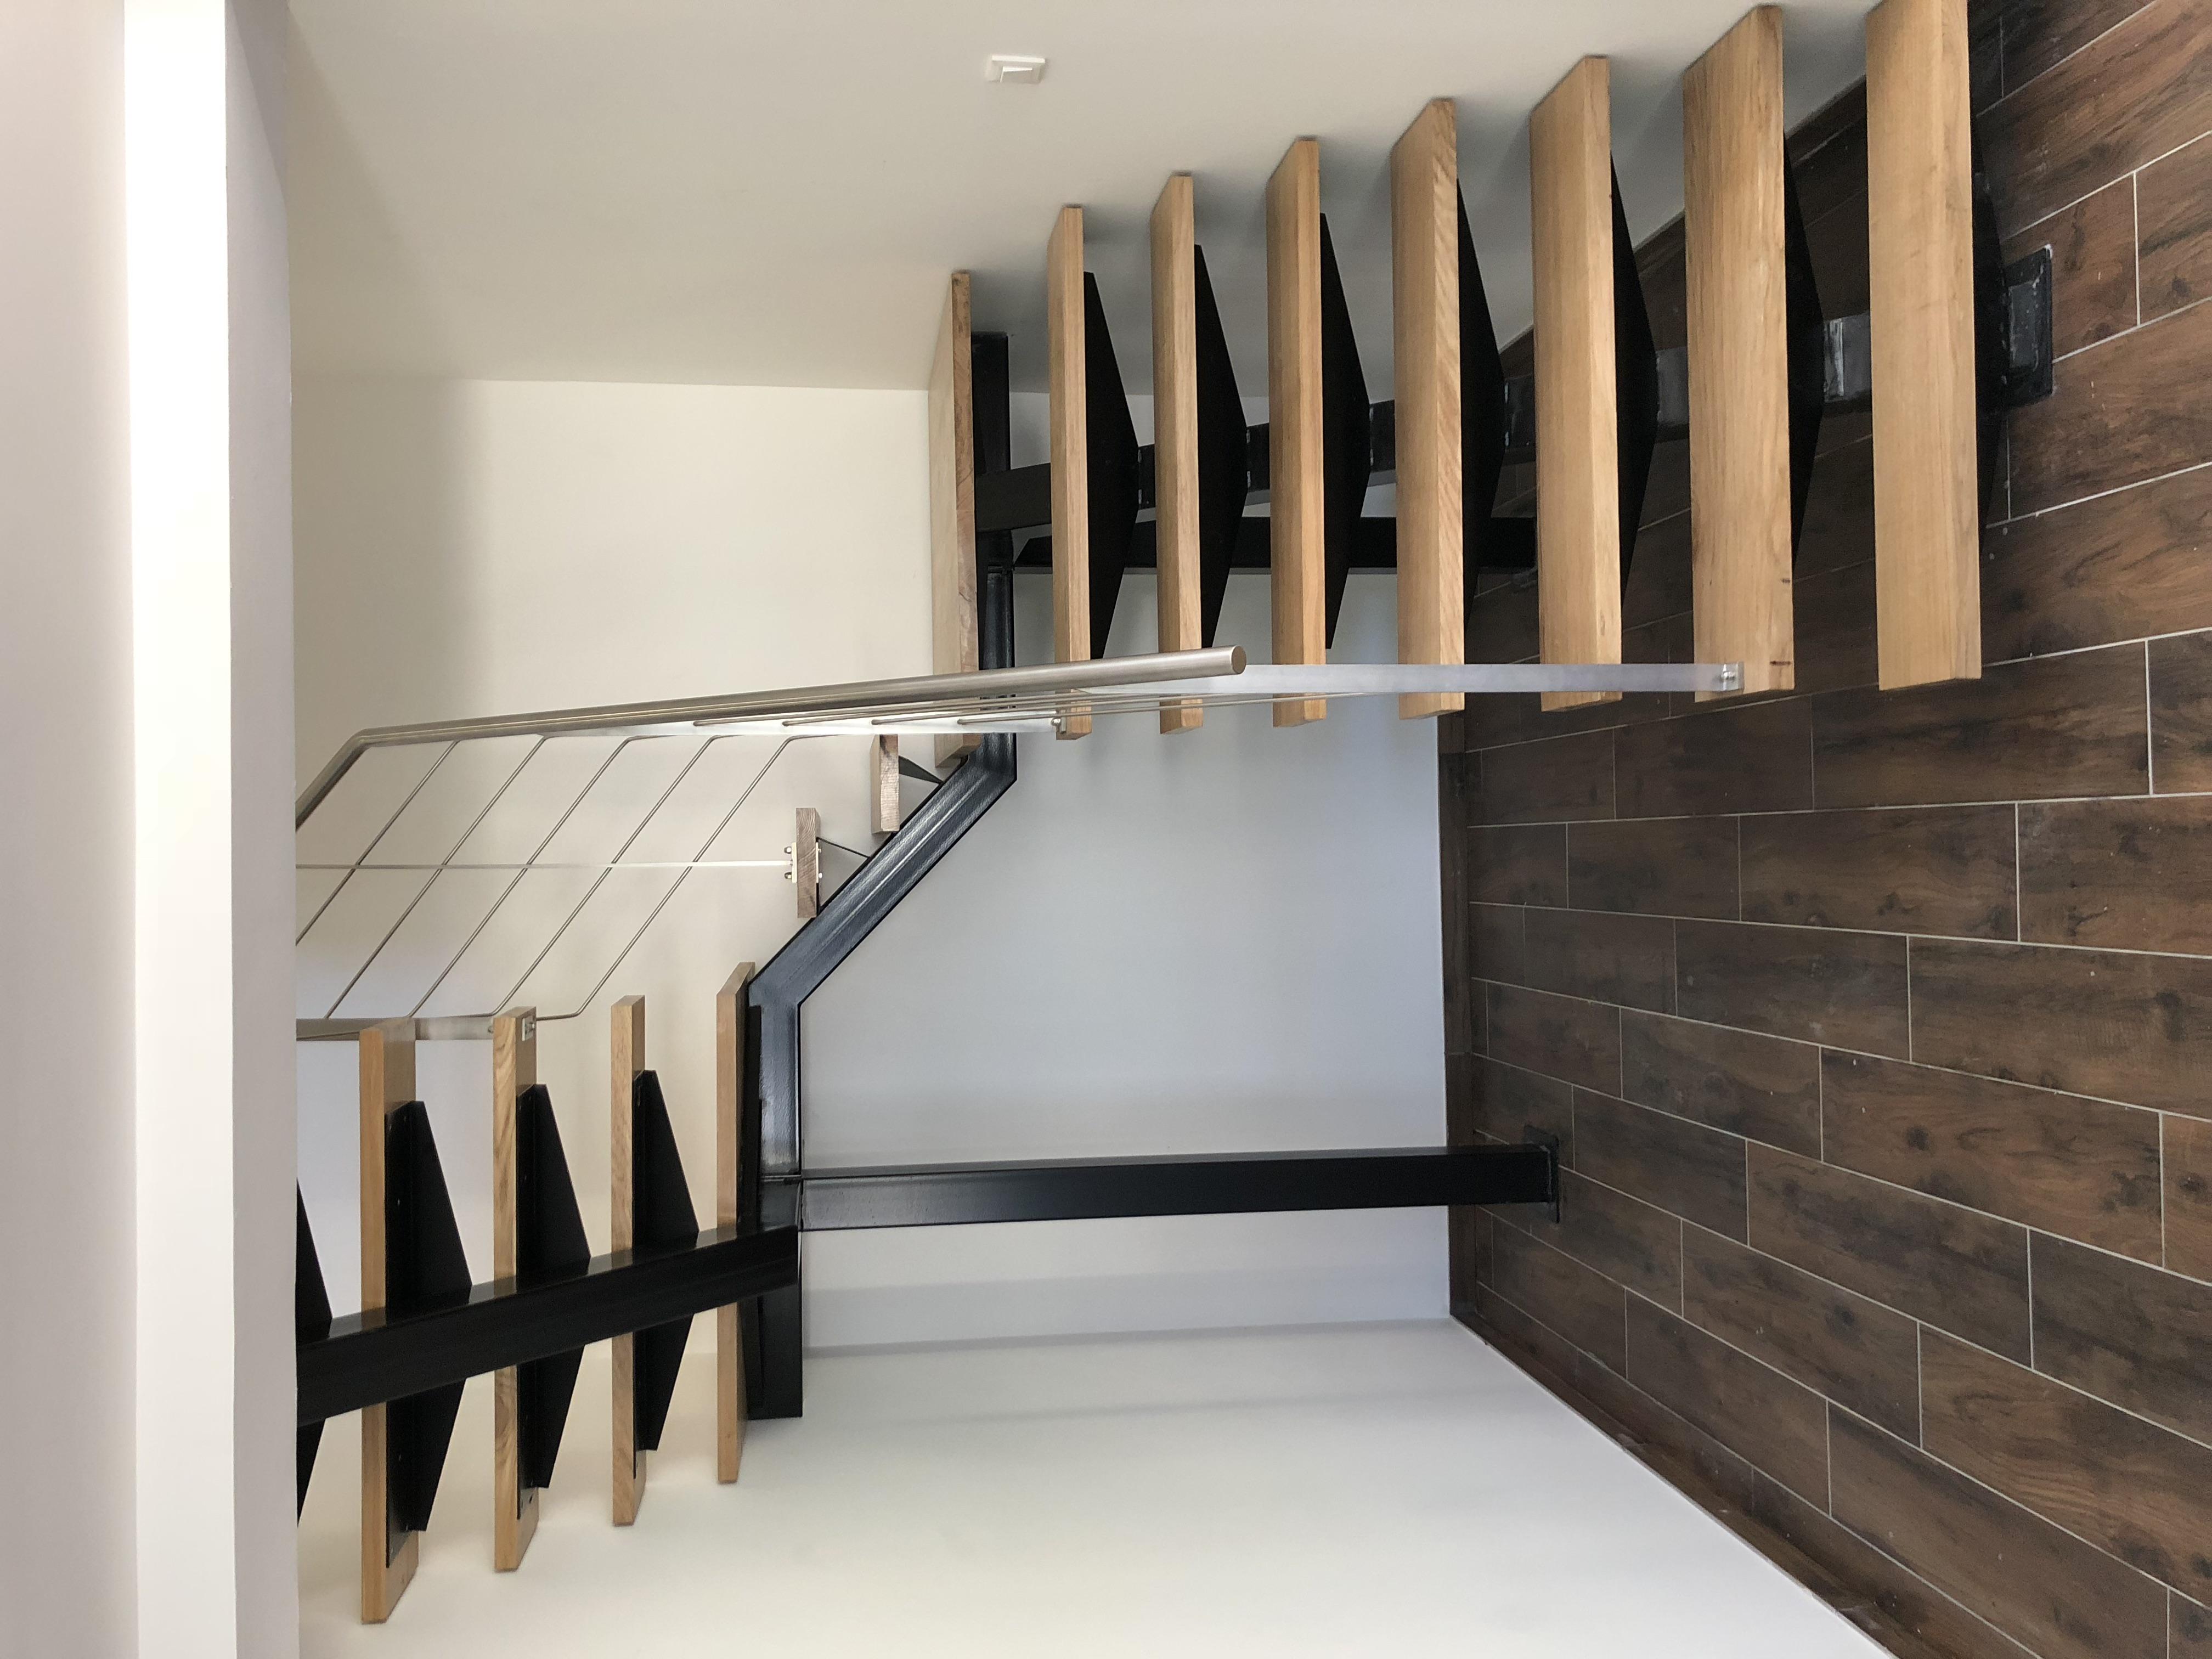 Escalier salon/mezzanine